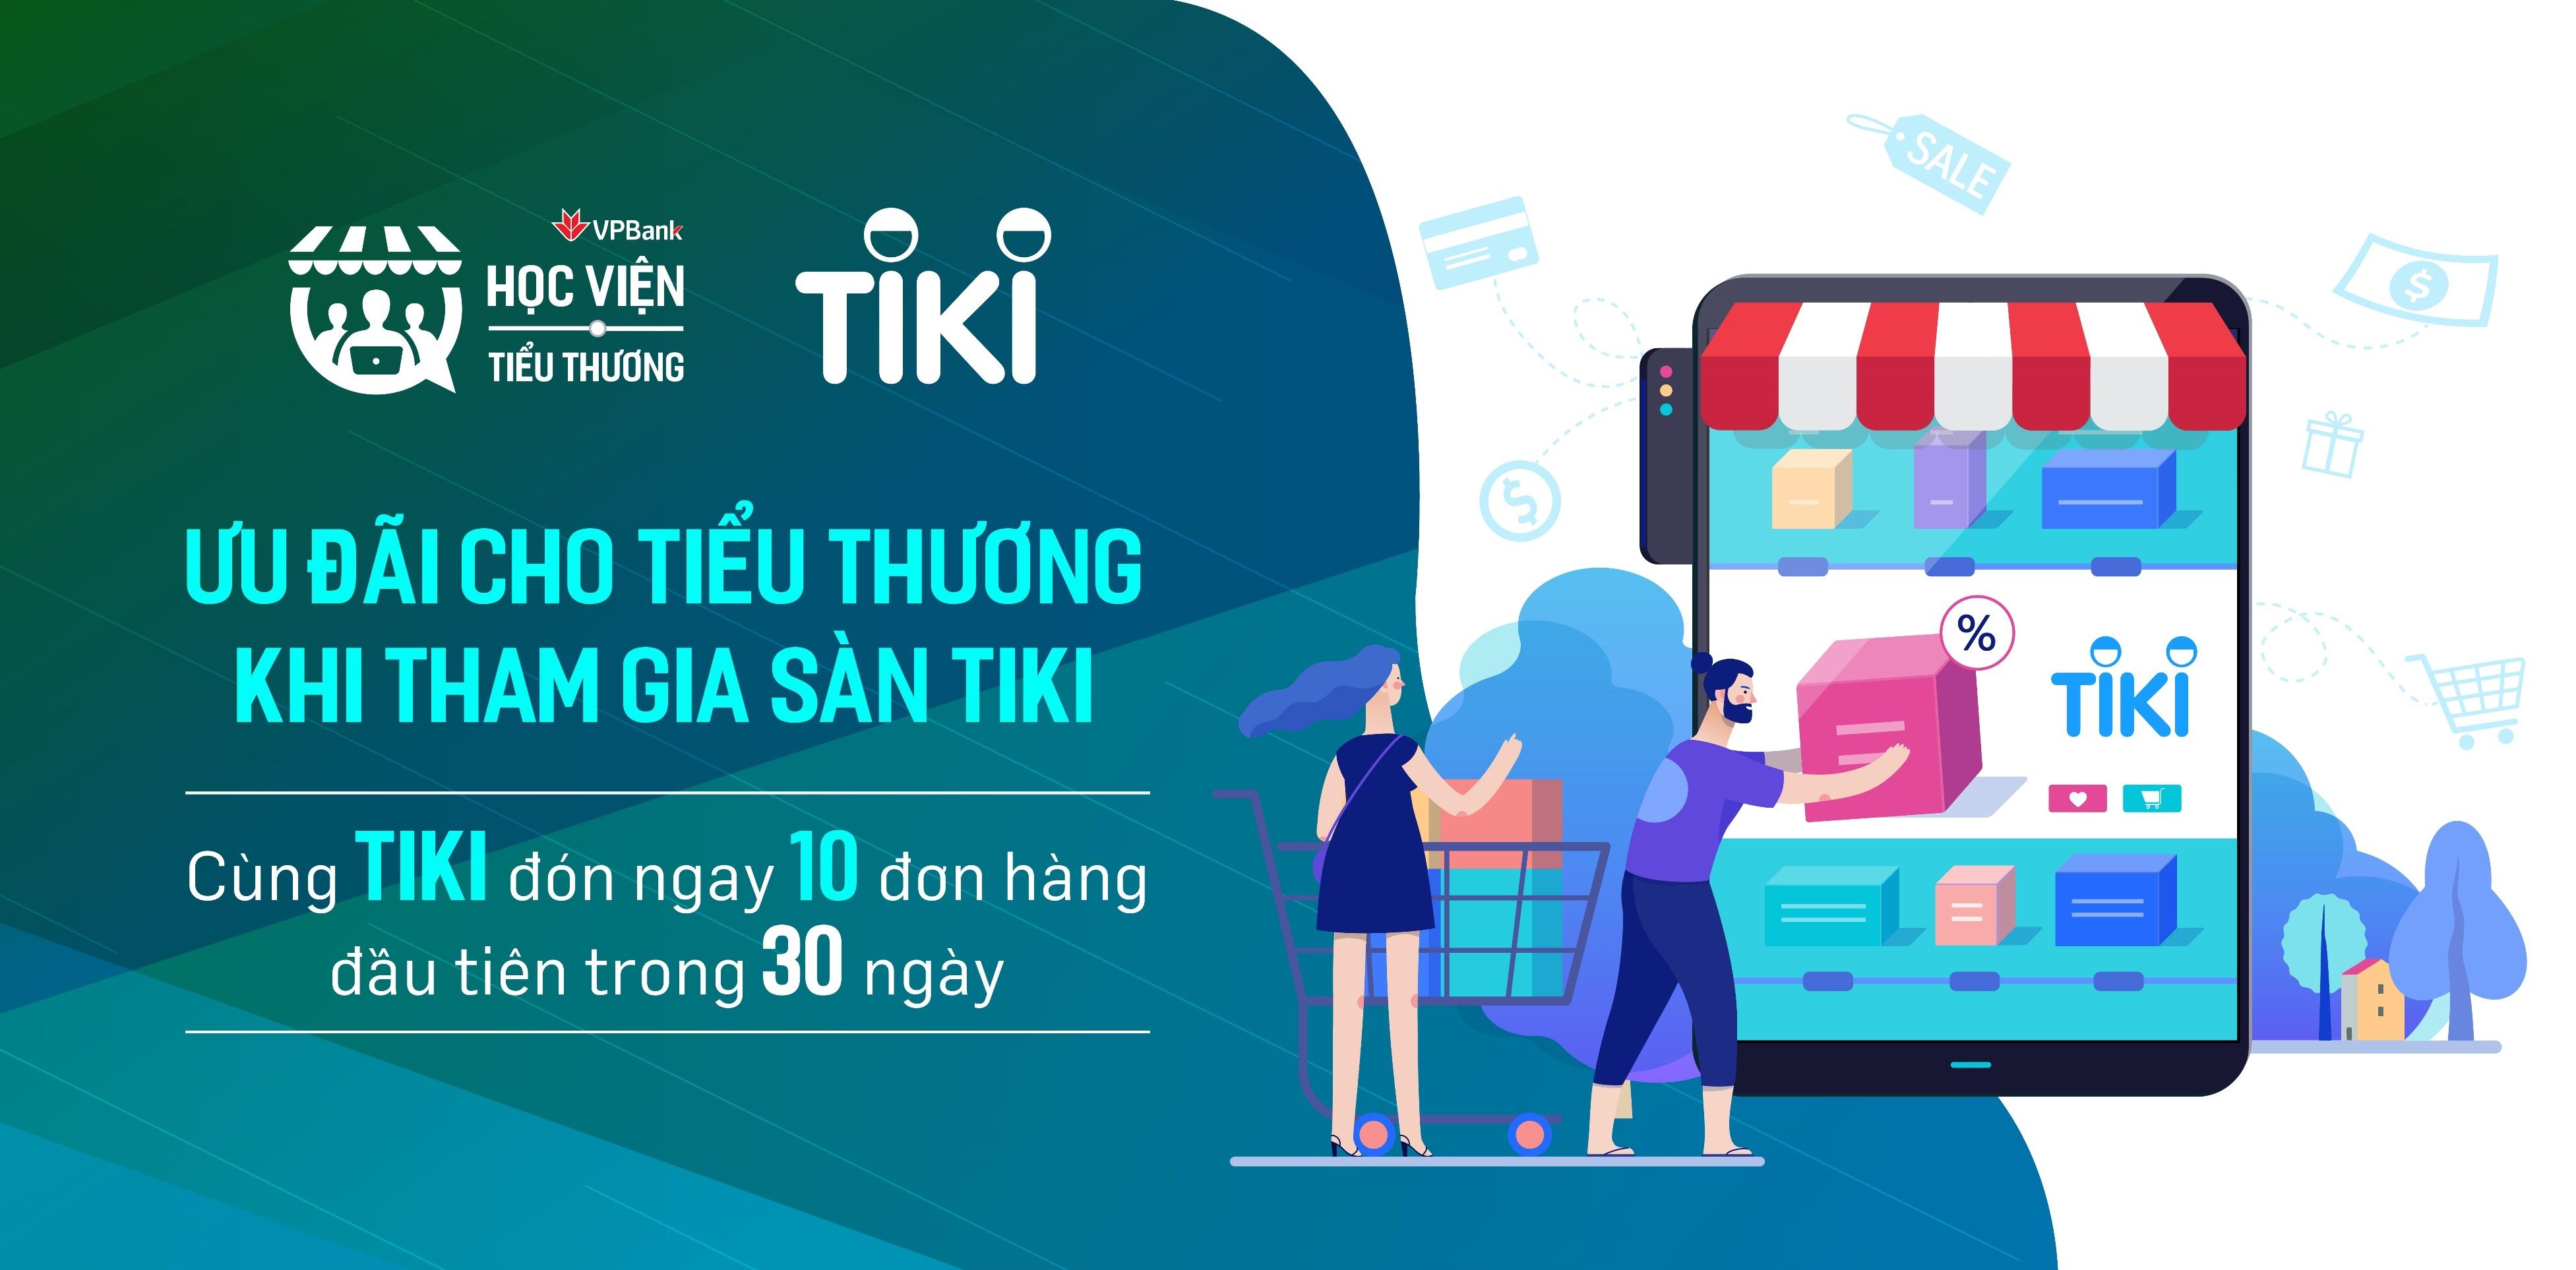 tiki cam ket ho tro one by one cho tieu thuong vpbank